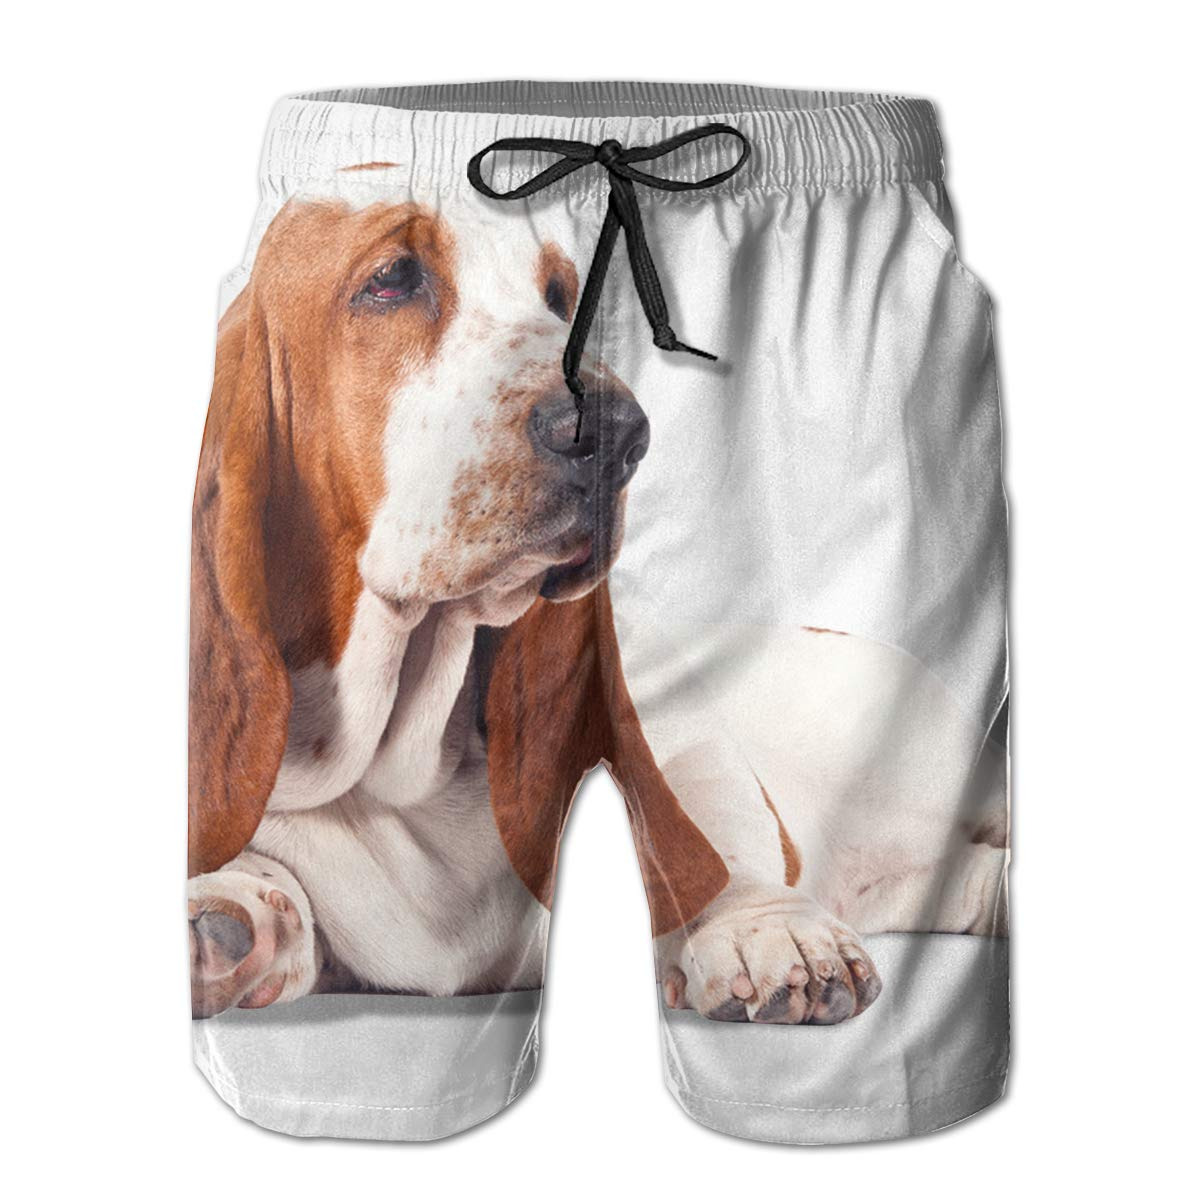 JF-X Basset Hound Dog Mens Summer Beach Surf Board Shorts Quick Dry Swimming Trunks Casual Loose Sleep Short Pants